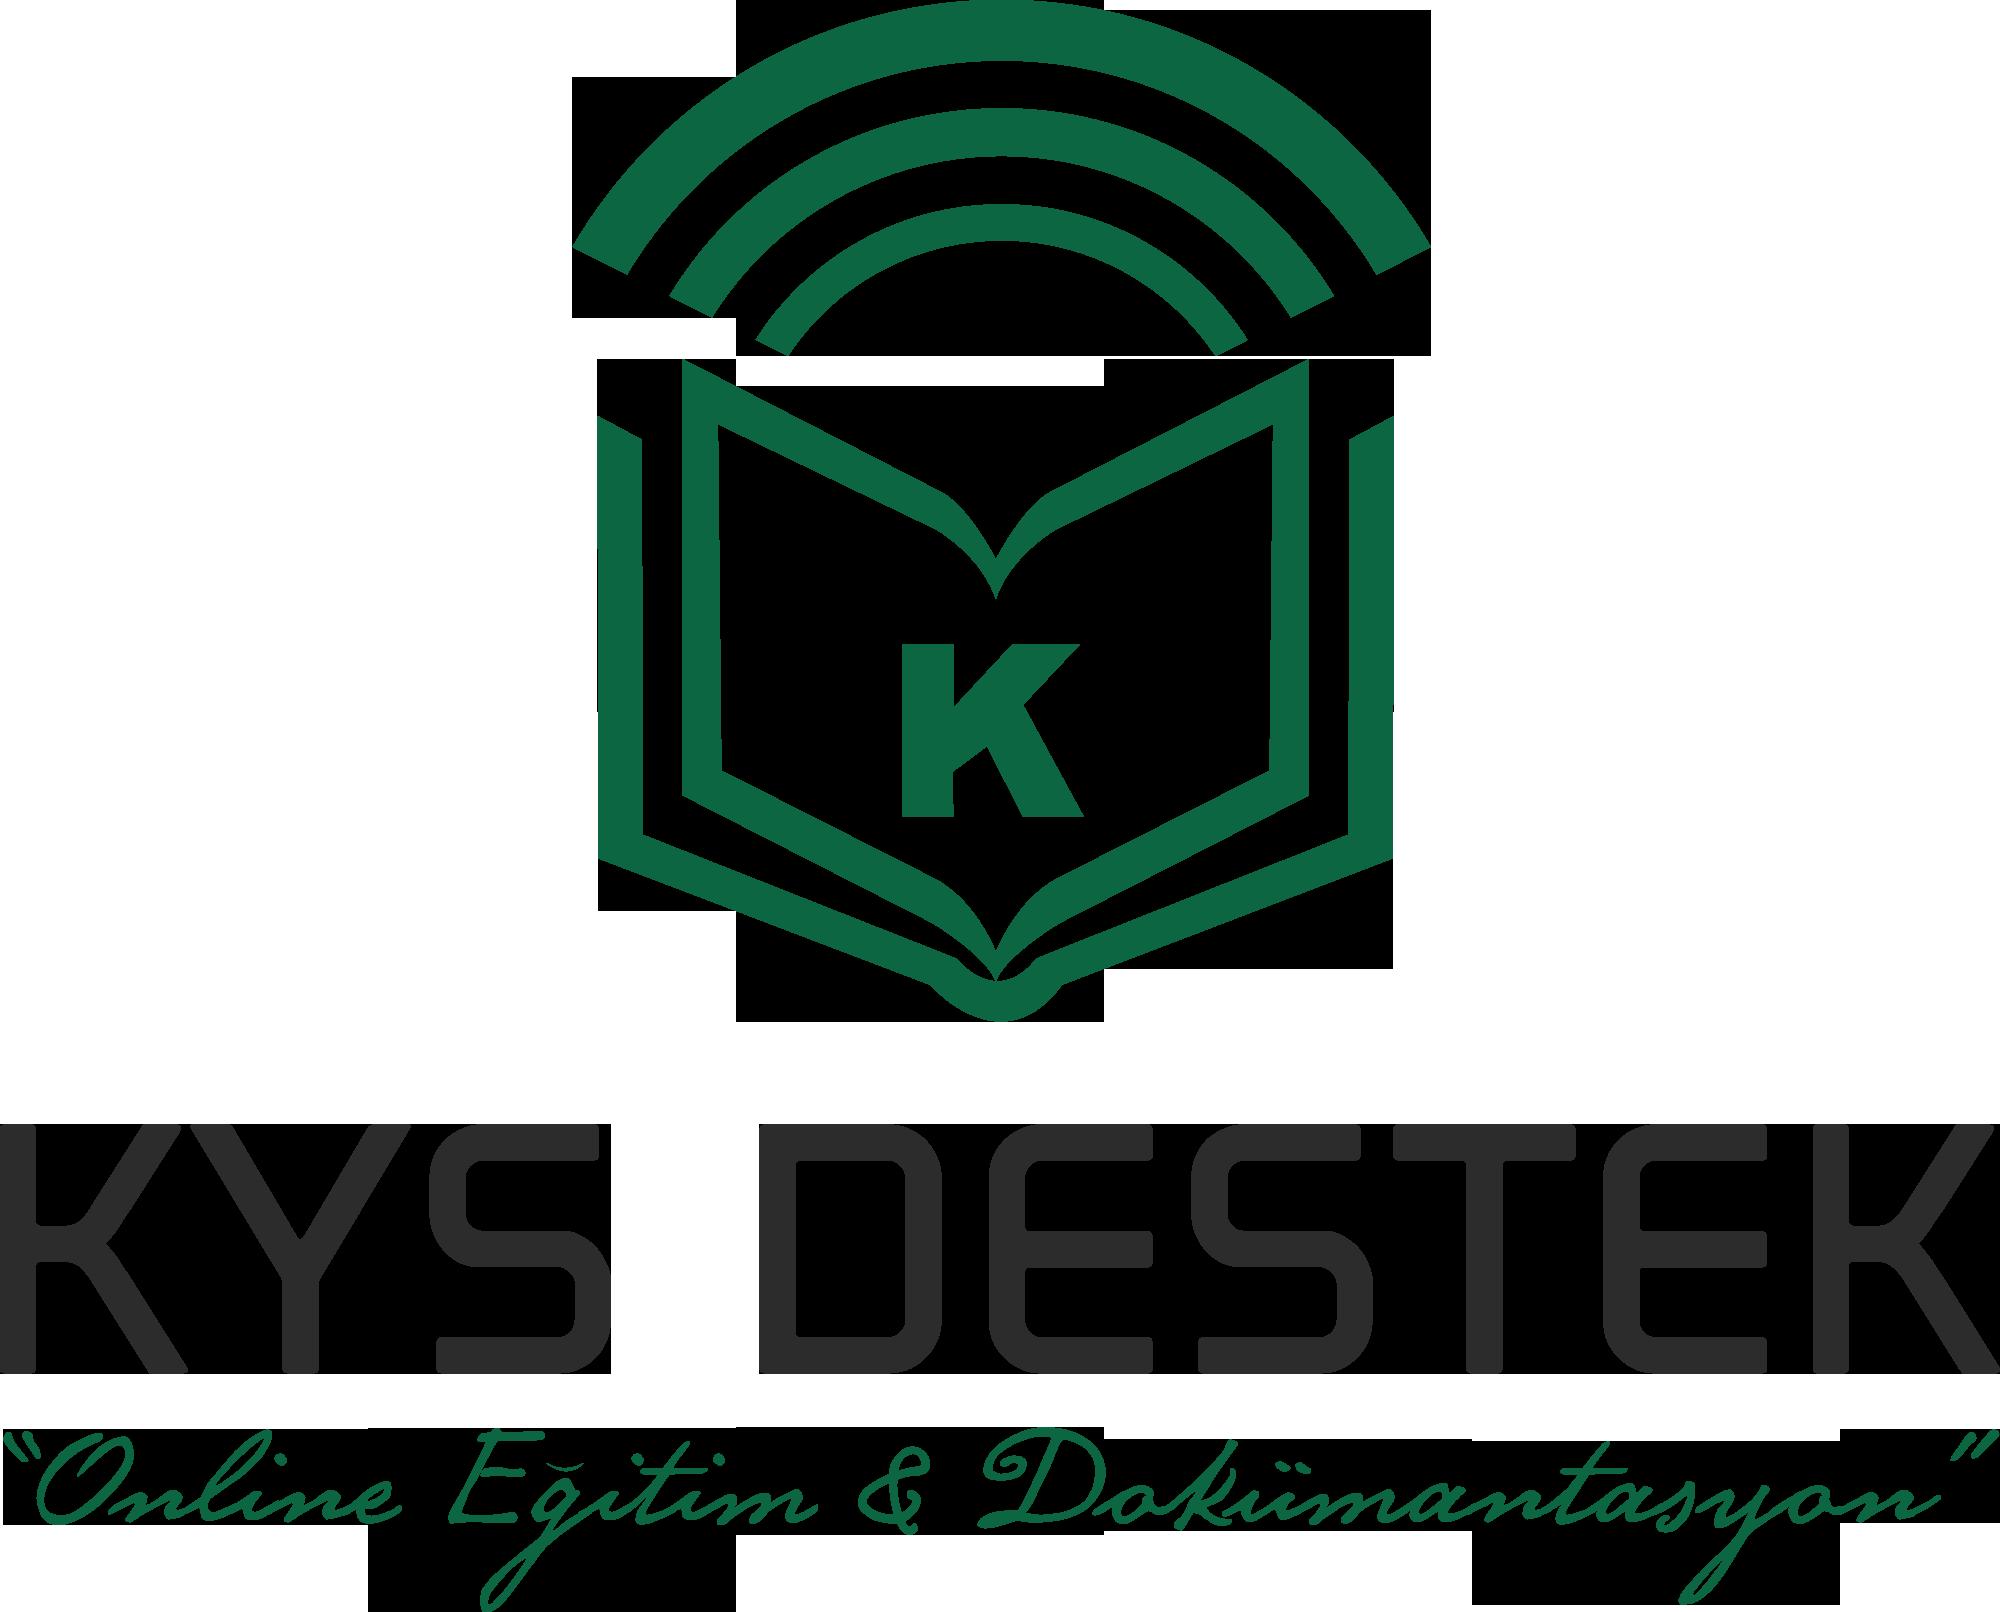 KYS DESTEK